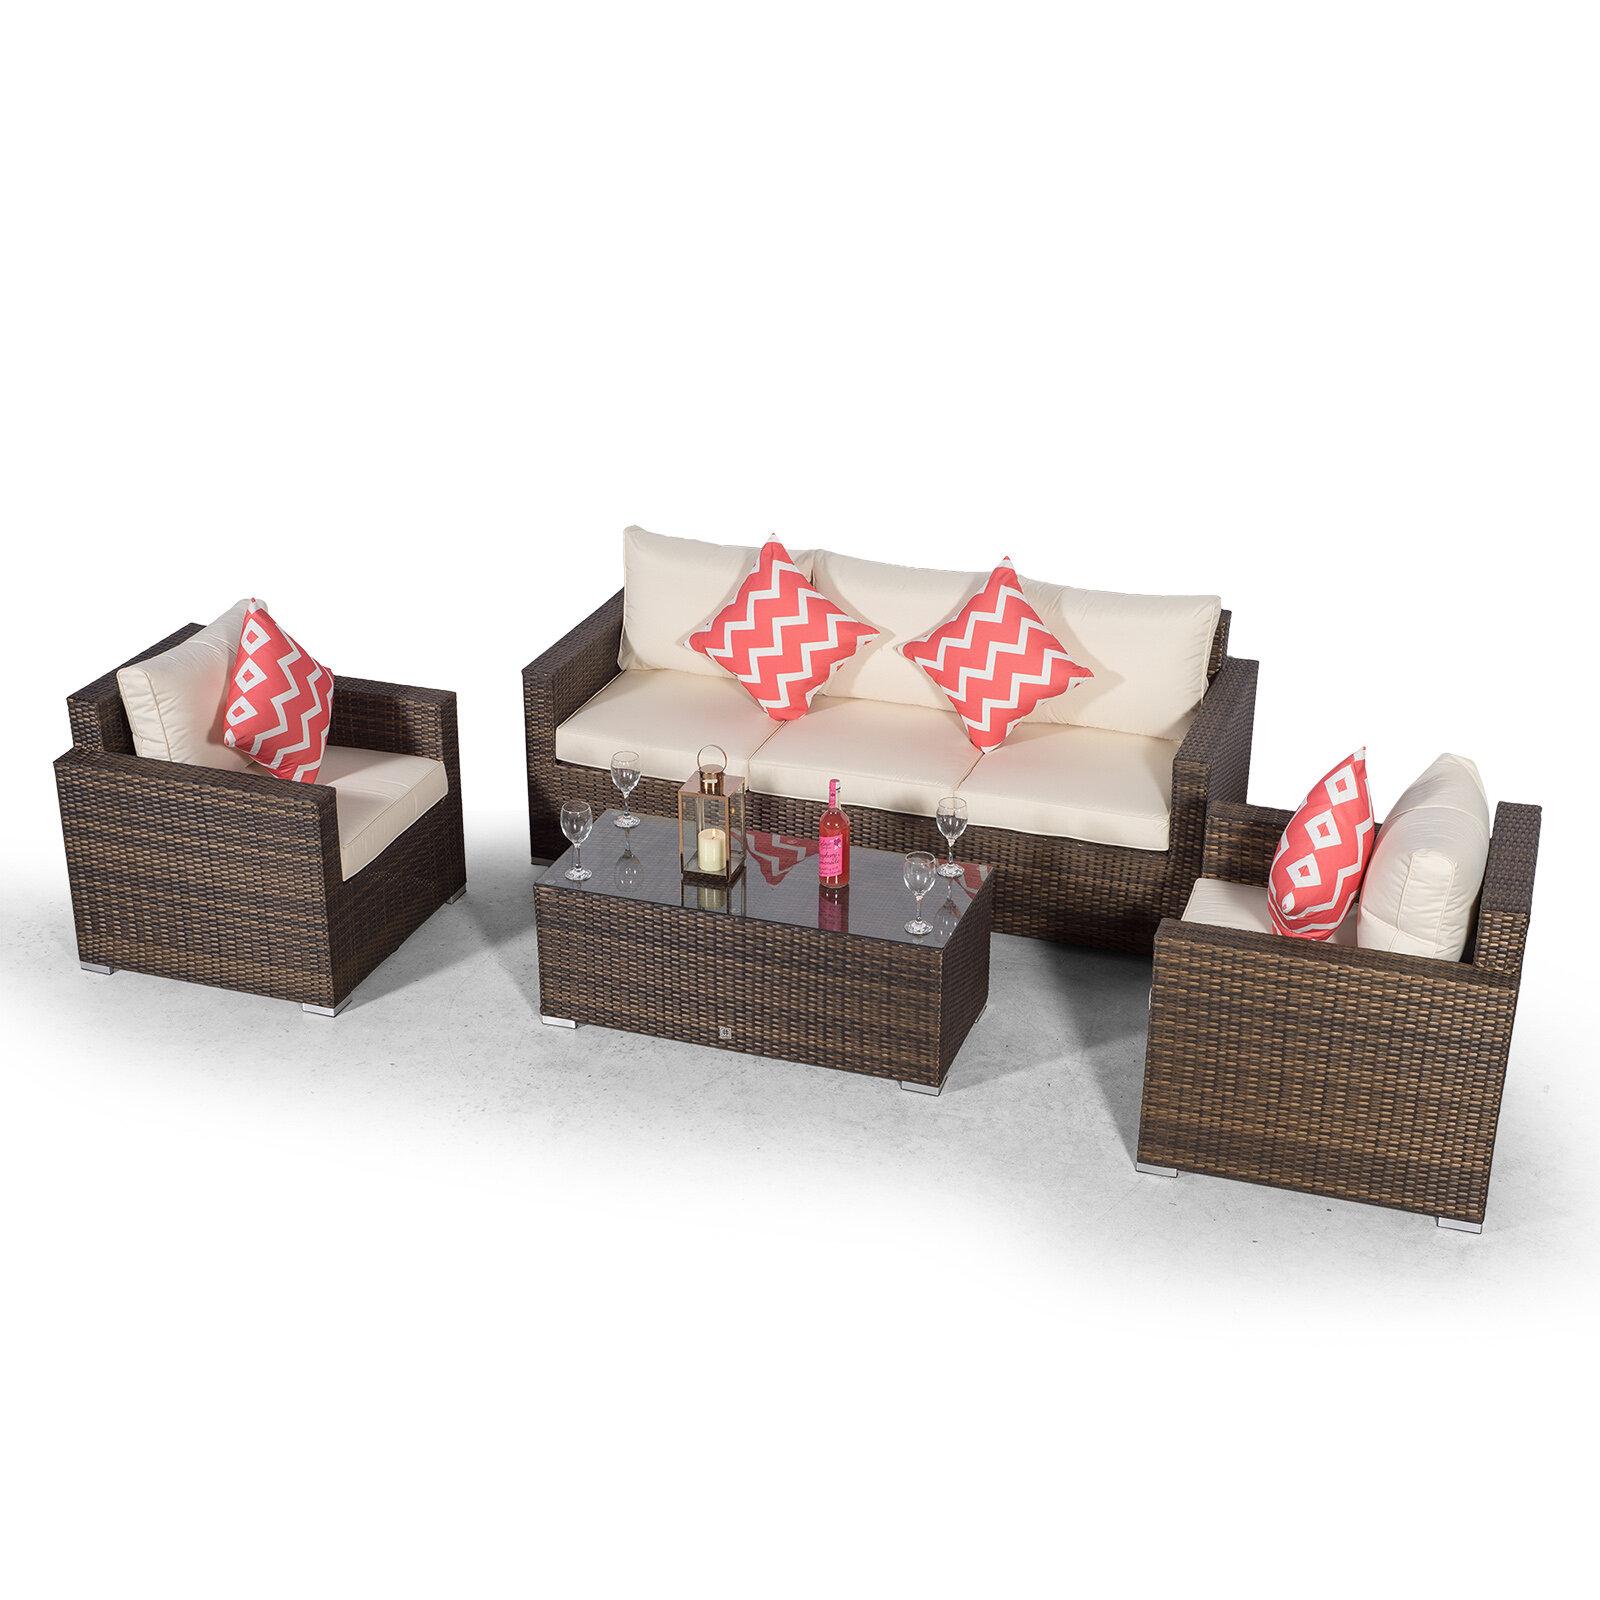 Villatoro Brown Rattan 9 Seat Sofa + 9 X Armchairs & Rectangle Coffee  Table, Outdoor Patio Garden Furniture